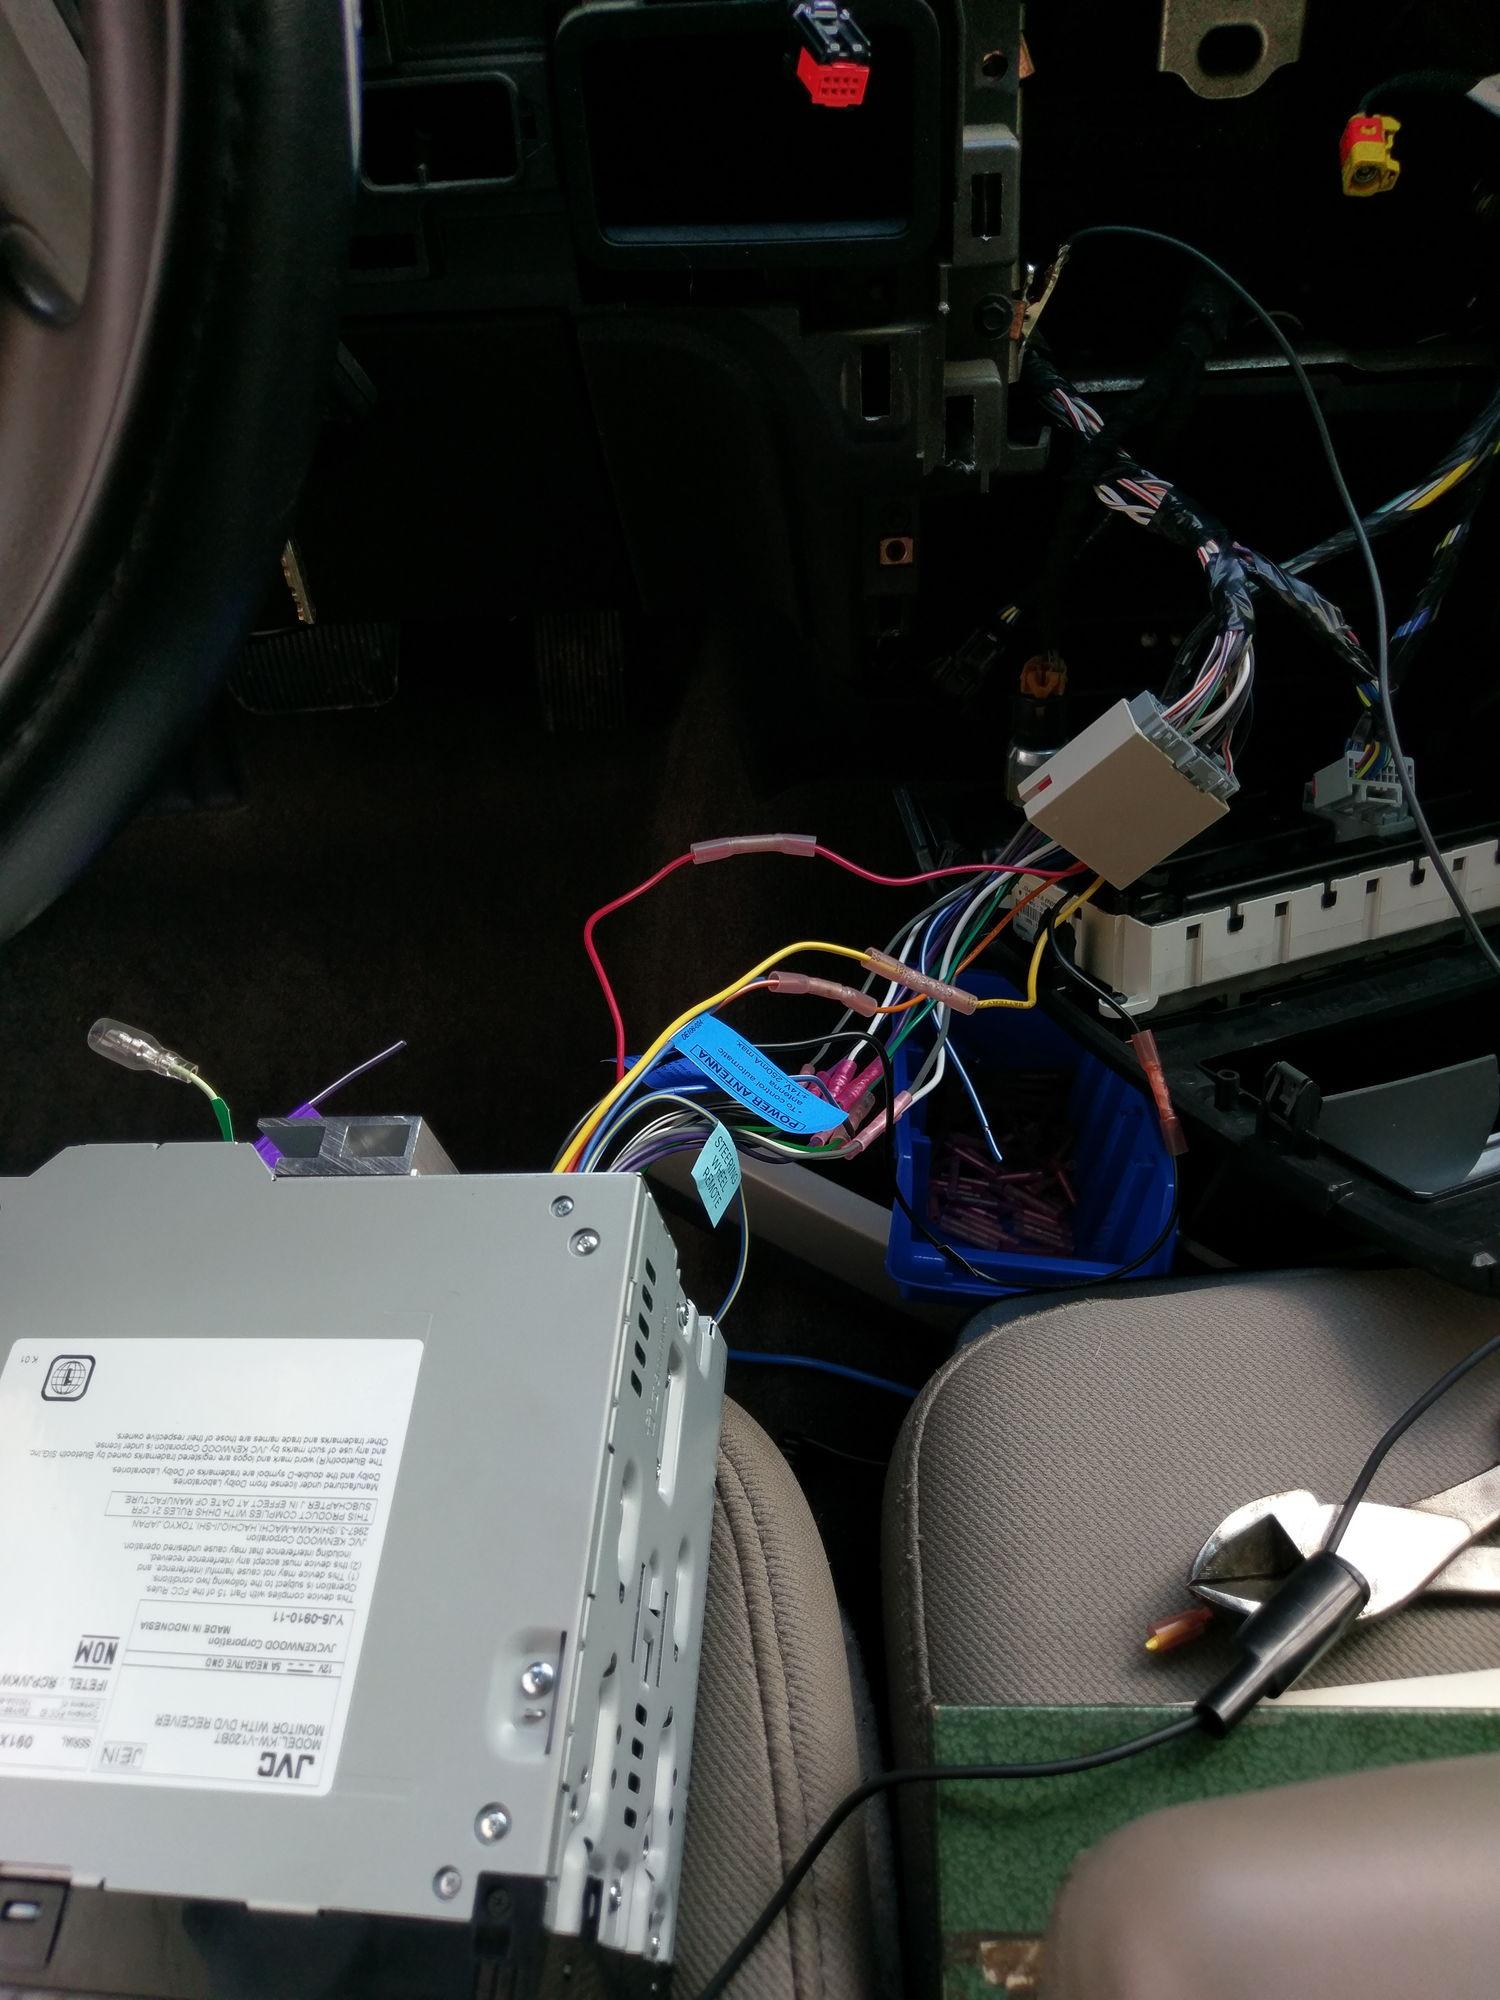 Aftermarket radio install no power - Ford F150 Forum ...